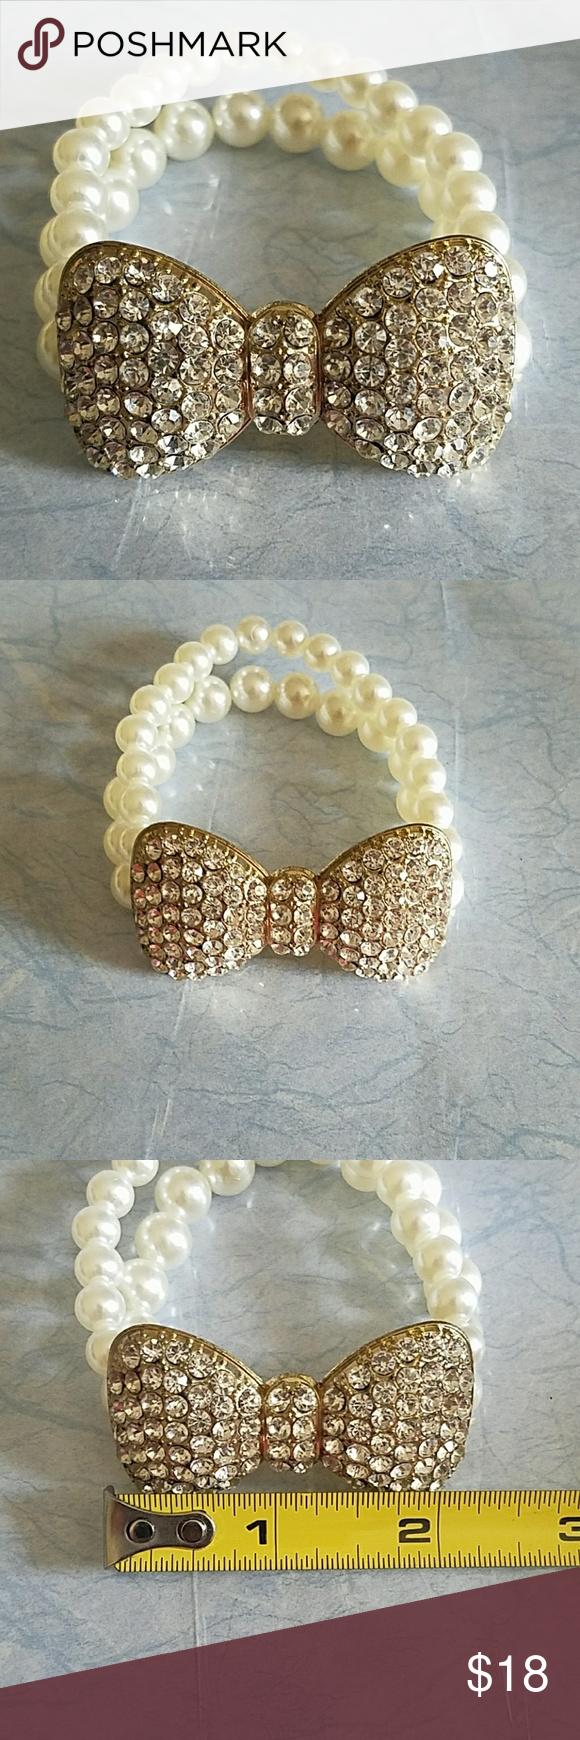 9273ae98bc338 Cute Rhinestone Bow Tie Pearl Bracelet. NWOT   My Posh Picks ...